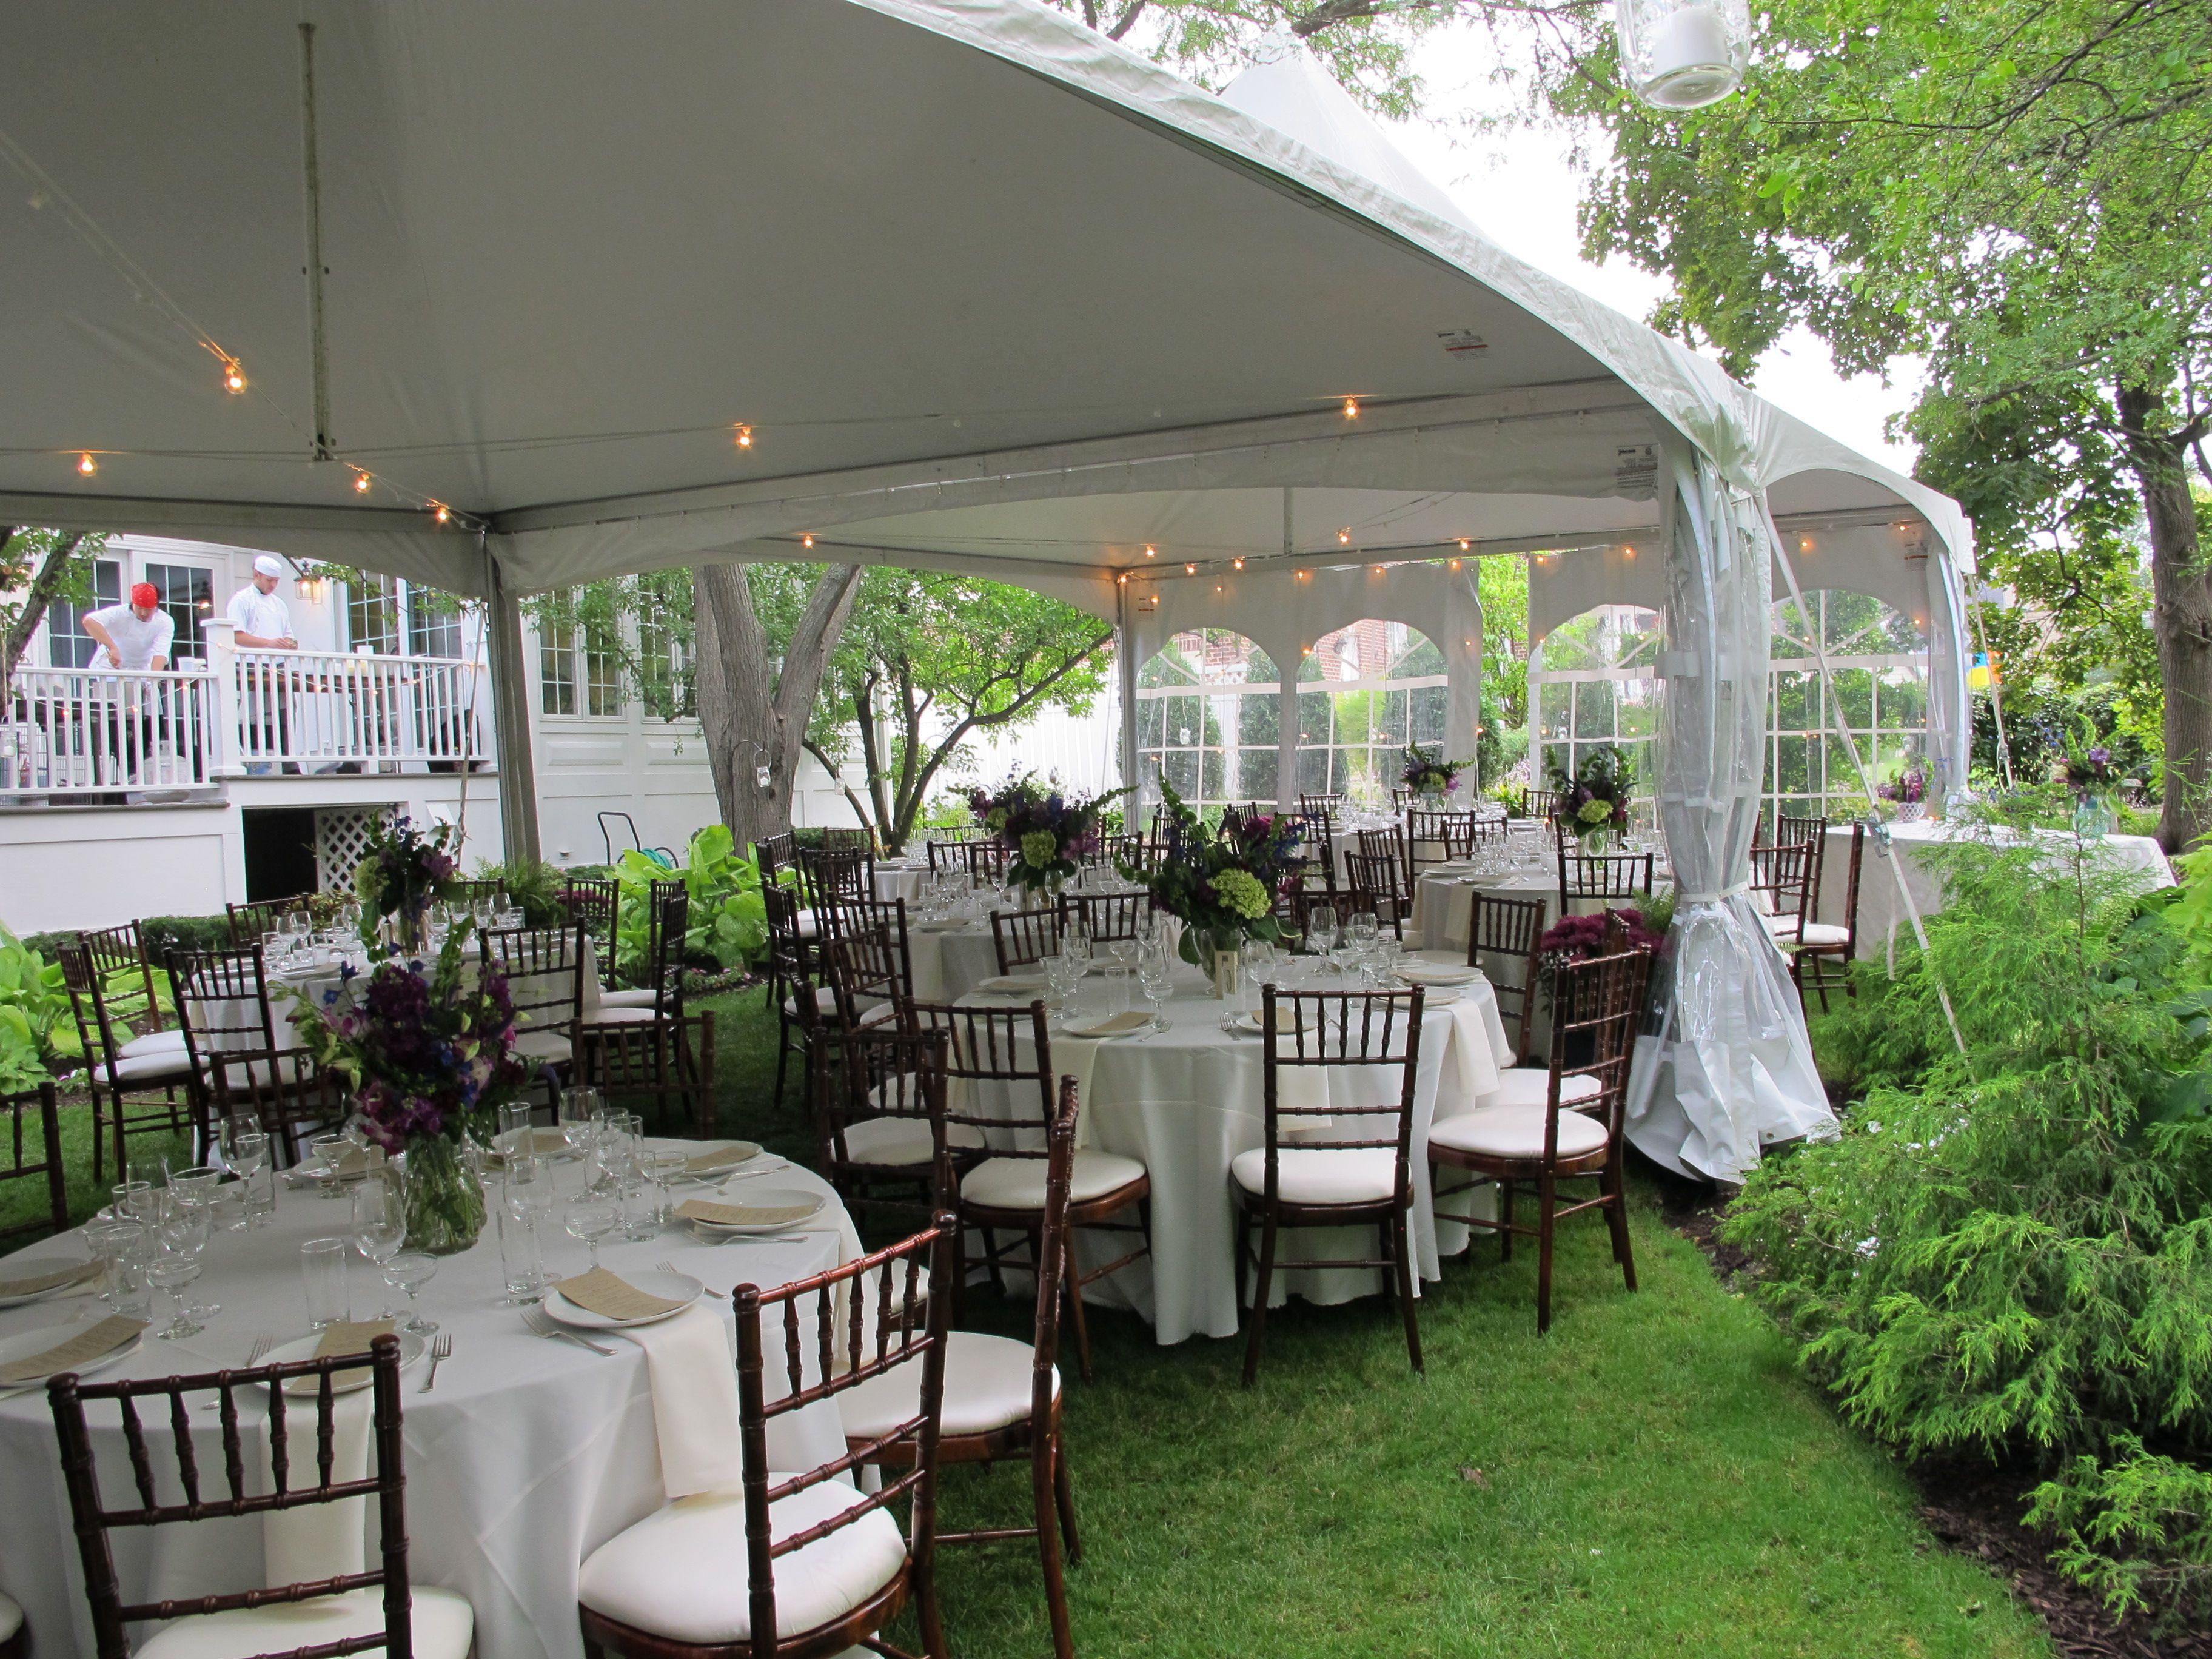 Backyard Wedding from Shane Godfrey graphy